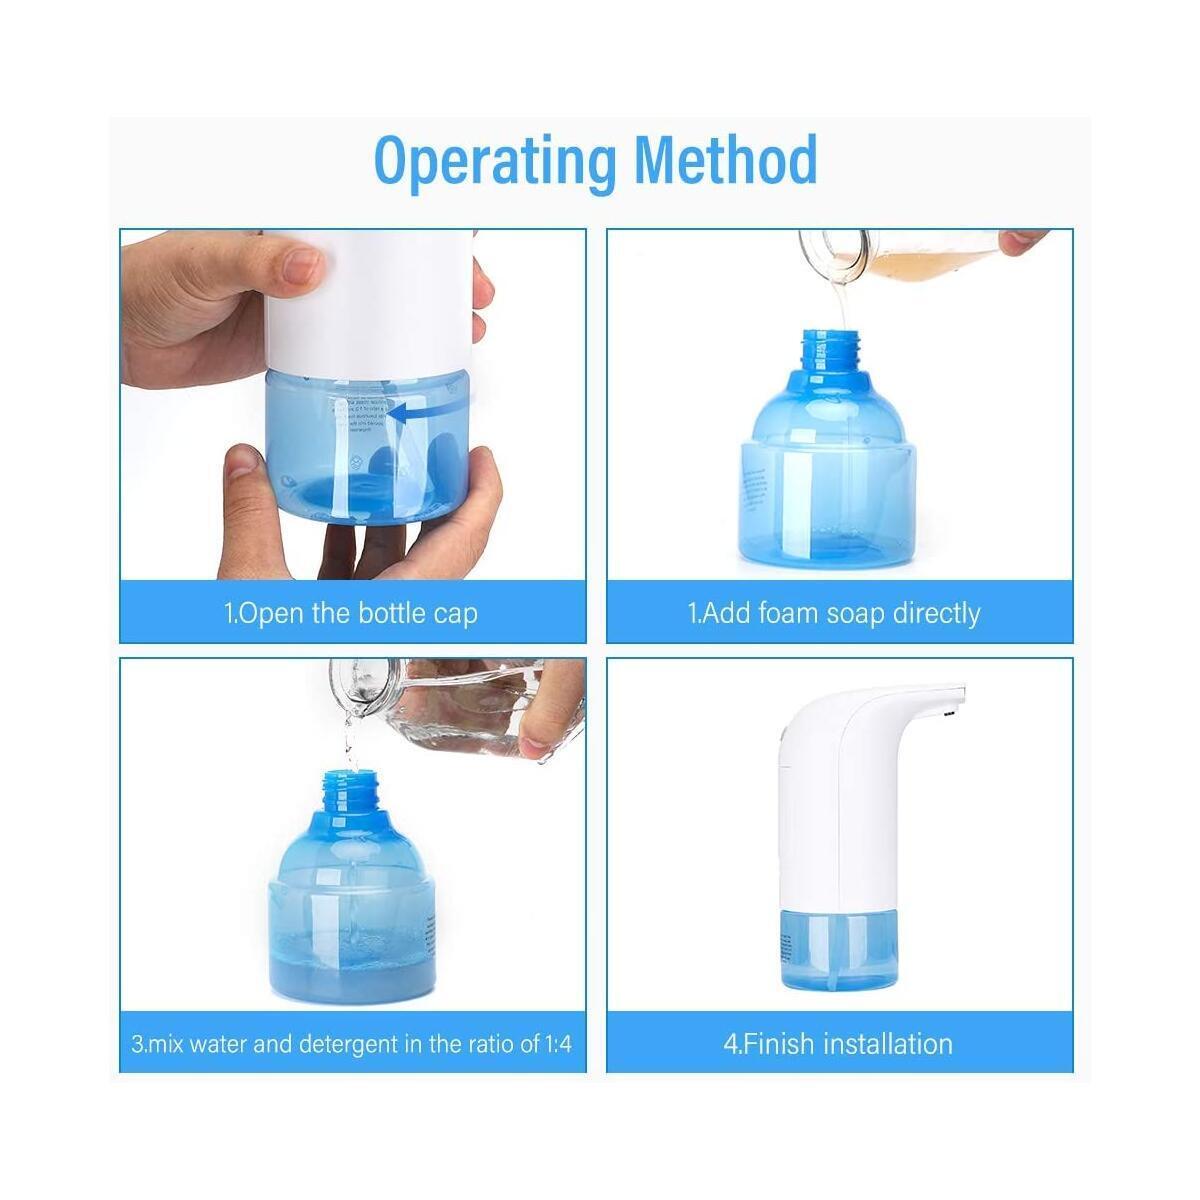 Touchless Soap Dispenser 20%OFF